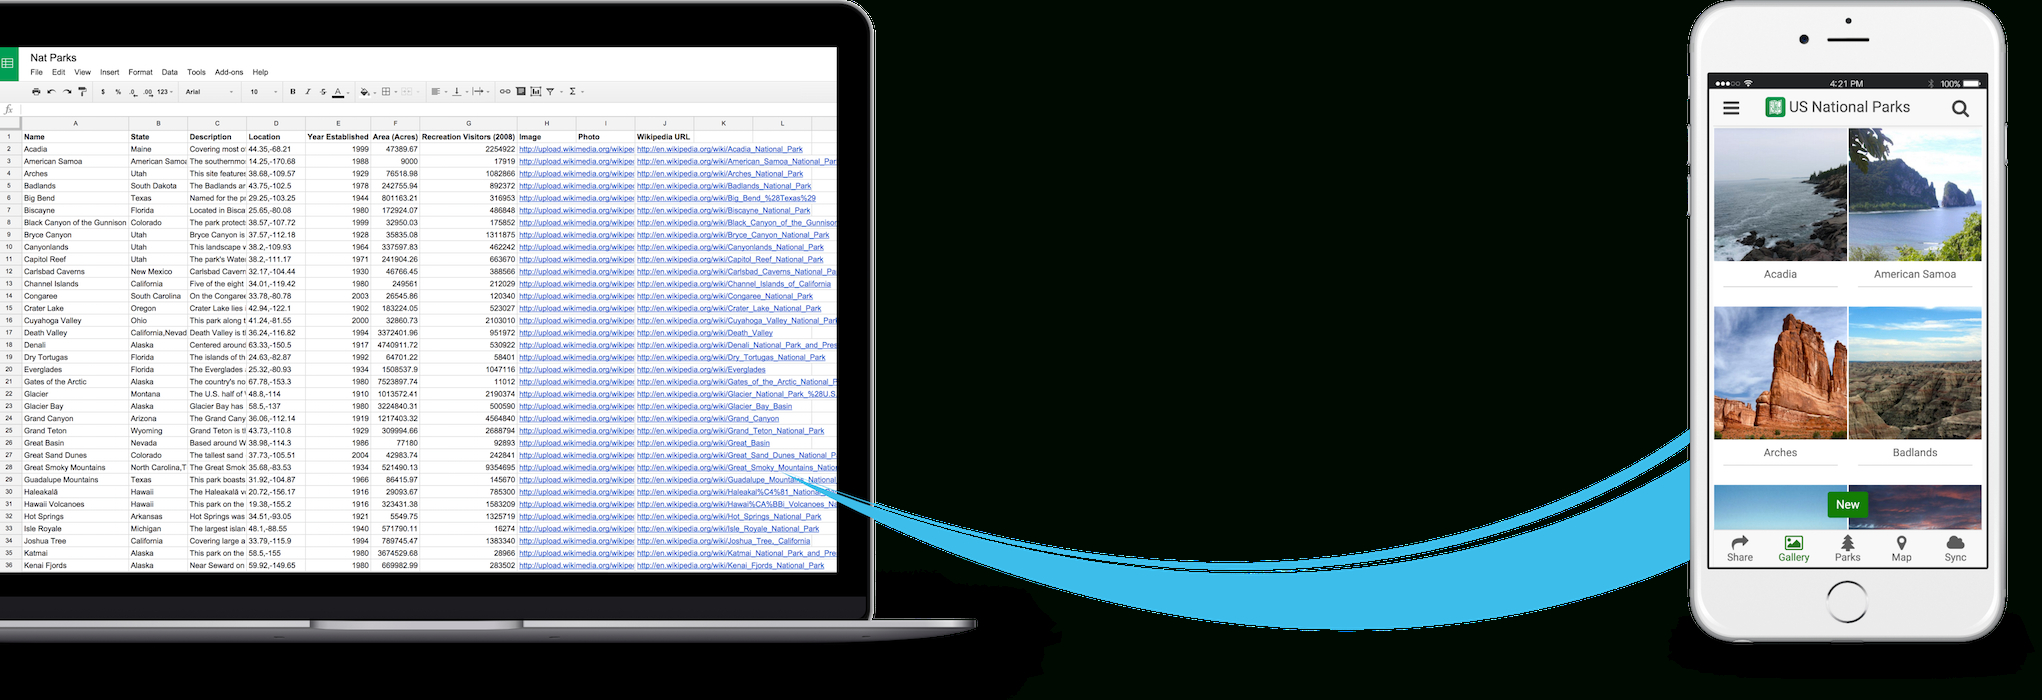 Google Spreadsheet App Throughout Make A Mobile App From Google Spreadsheets And Forms  Appsheet